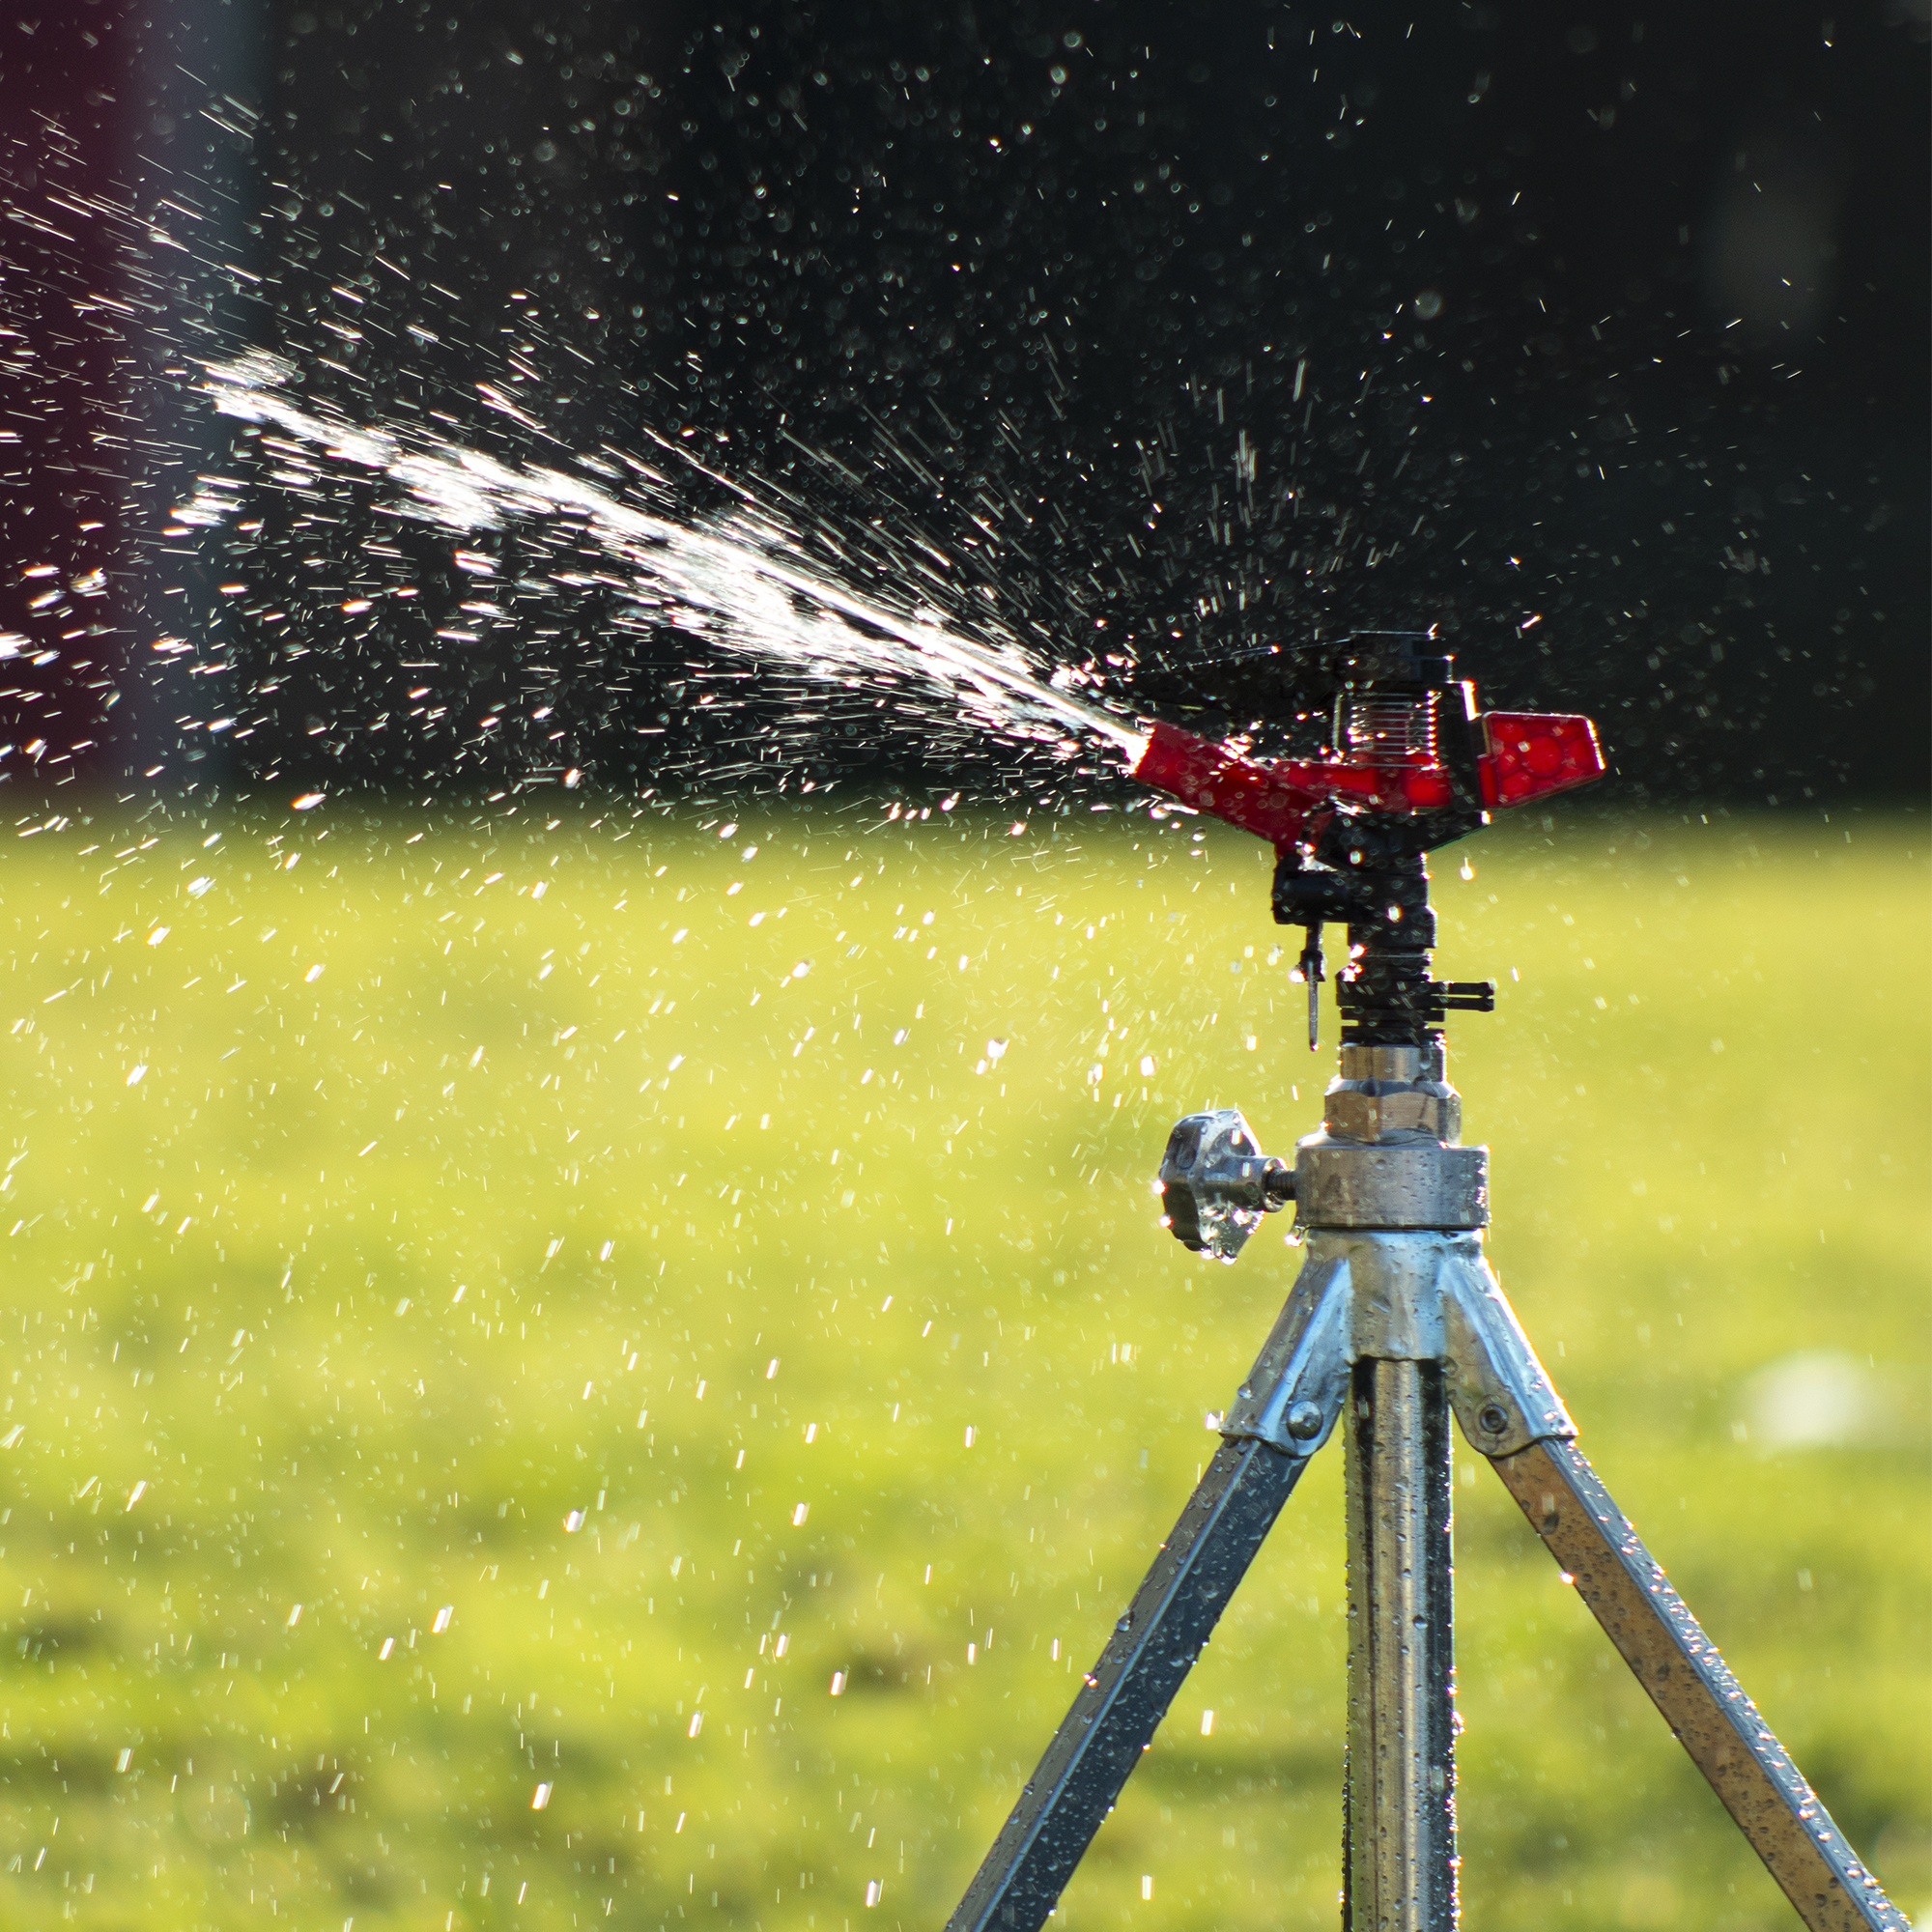 Sprinkler Heads